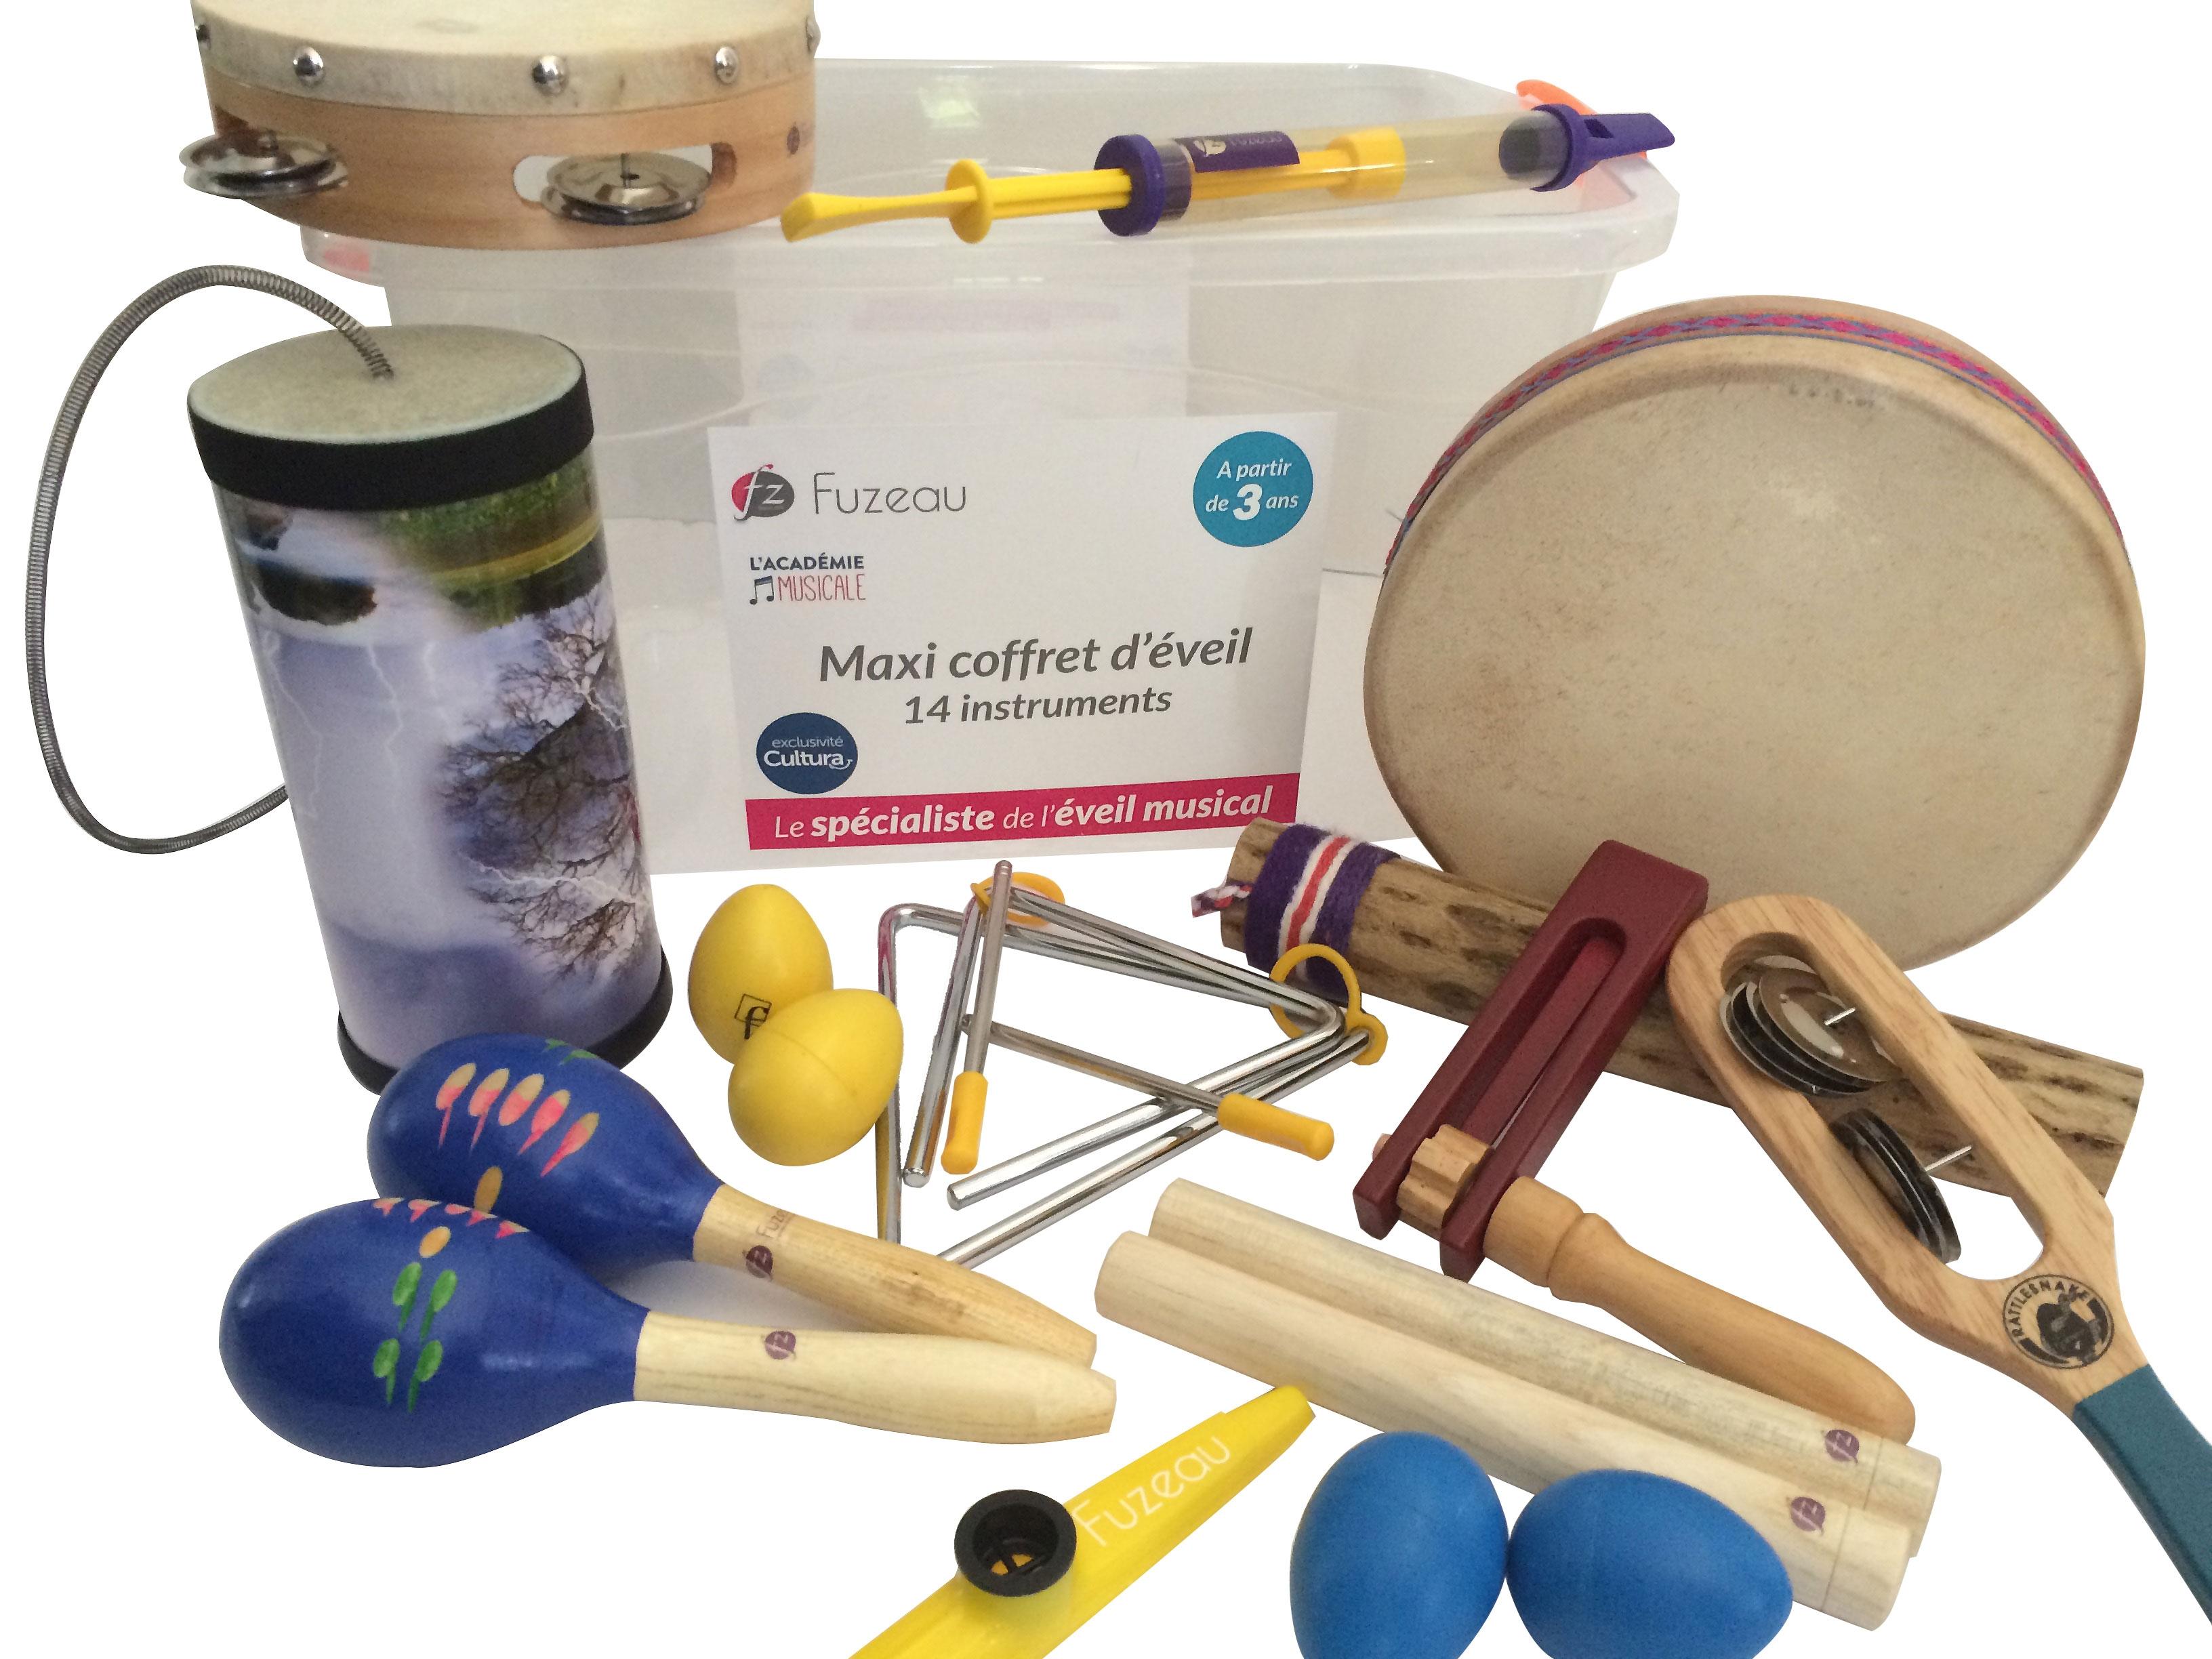 Fuzeau - Maxi coffret d\'éveil - 14 instruments